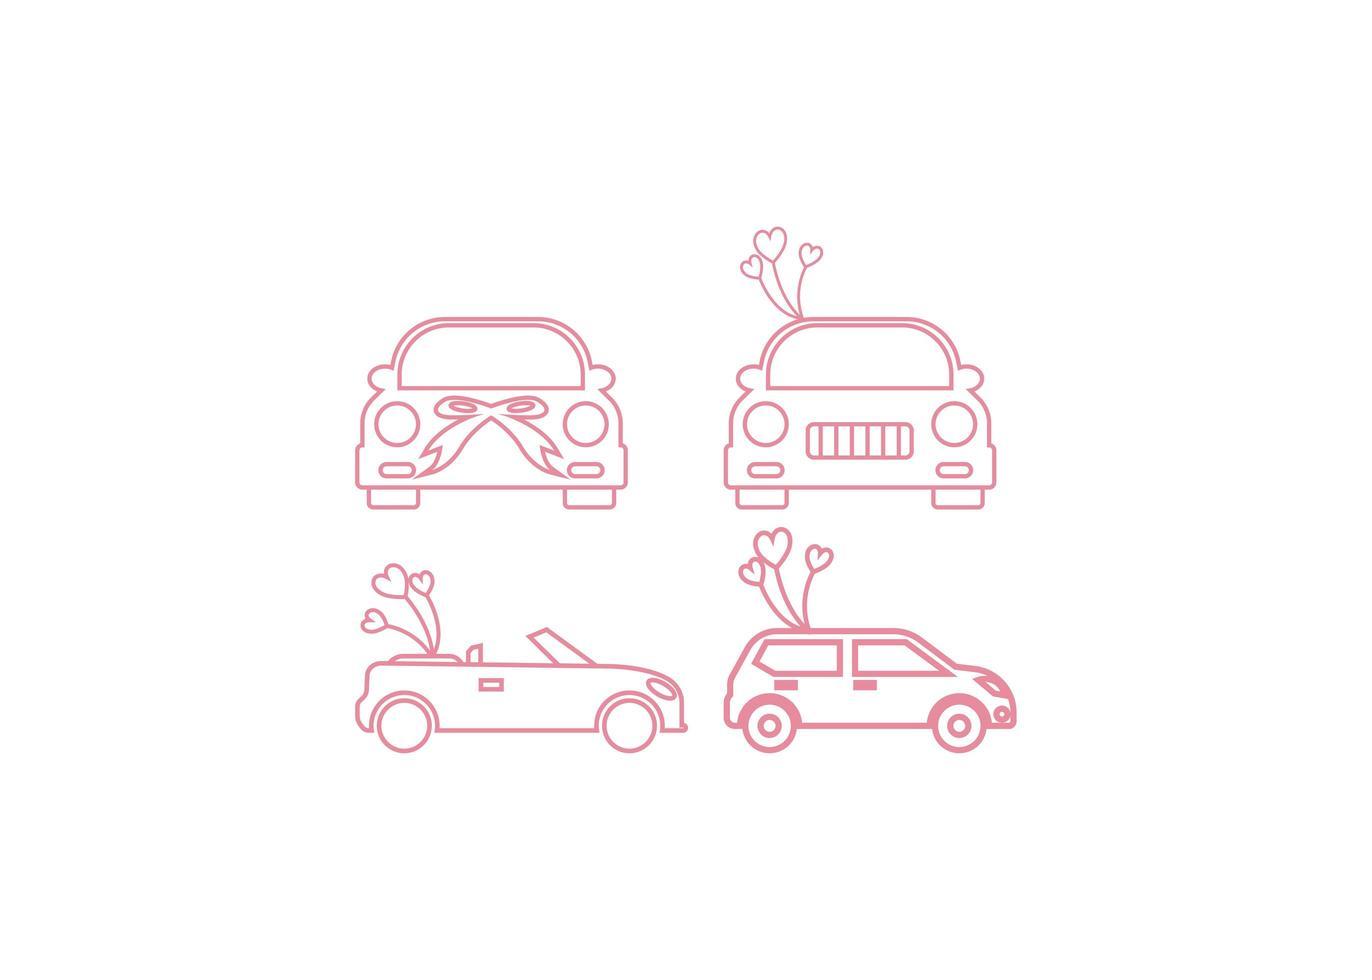 Hochzeitsautoikonen-Entwurfsschablonenvektor lokalisierte Illustration vektor